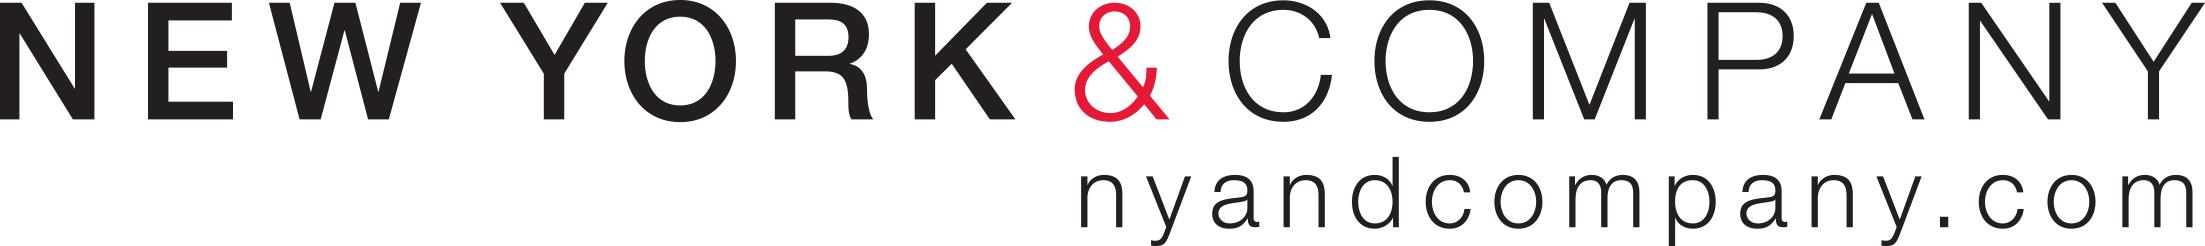 NYCo logo and web